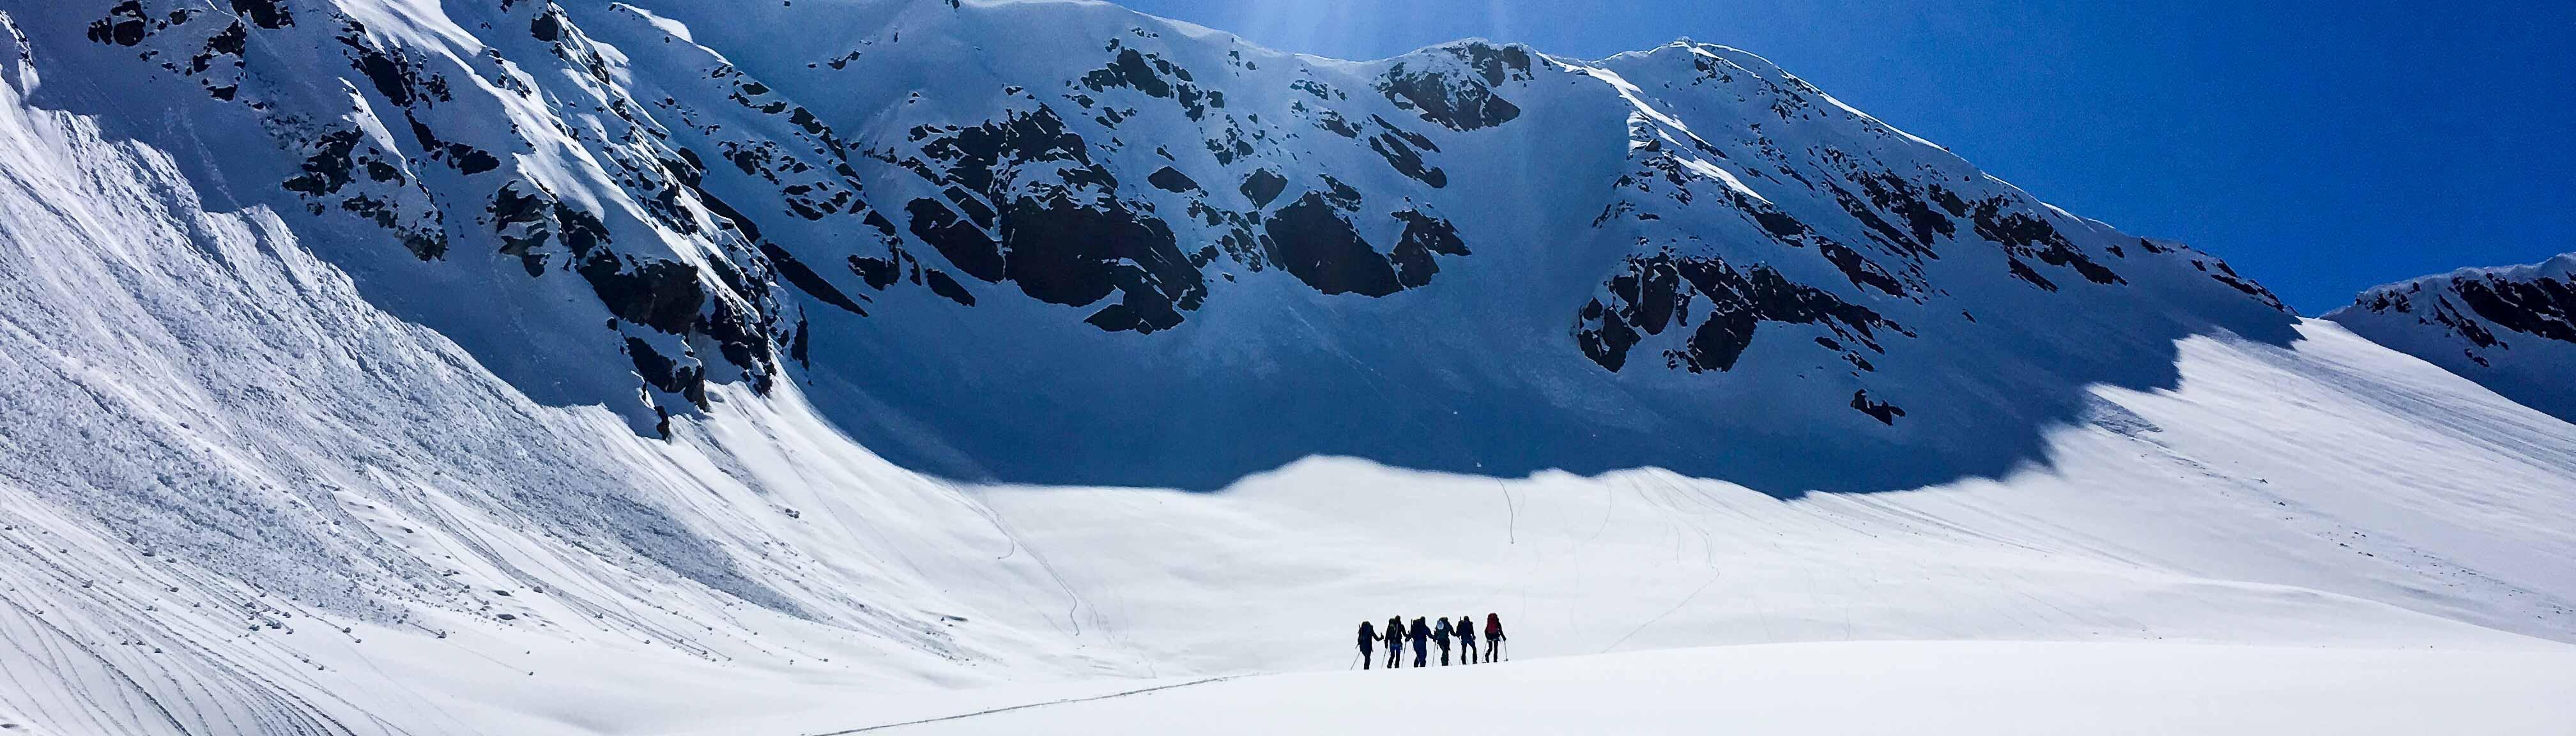 skitouren trainingswoche